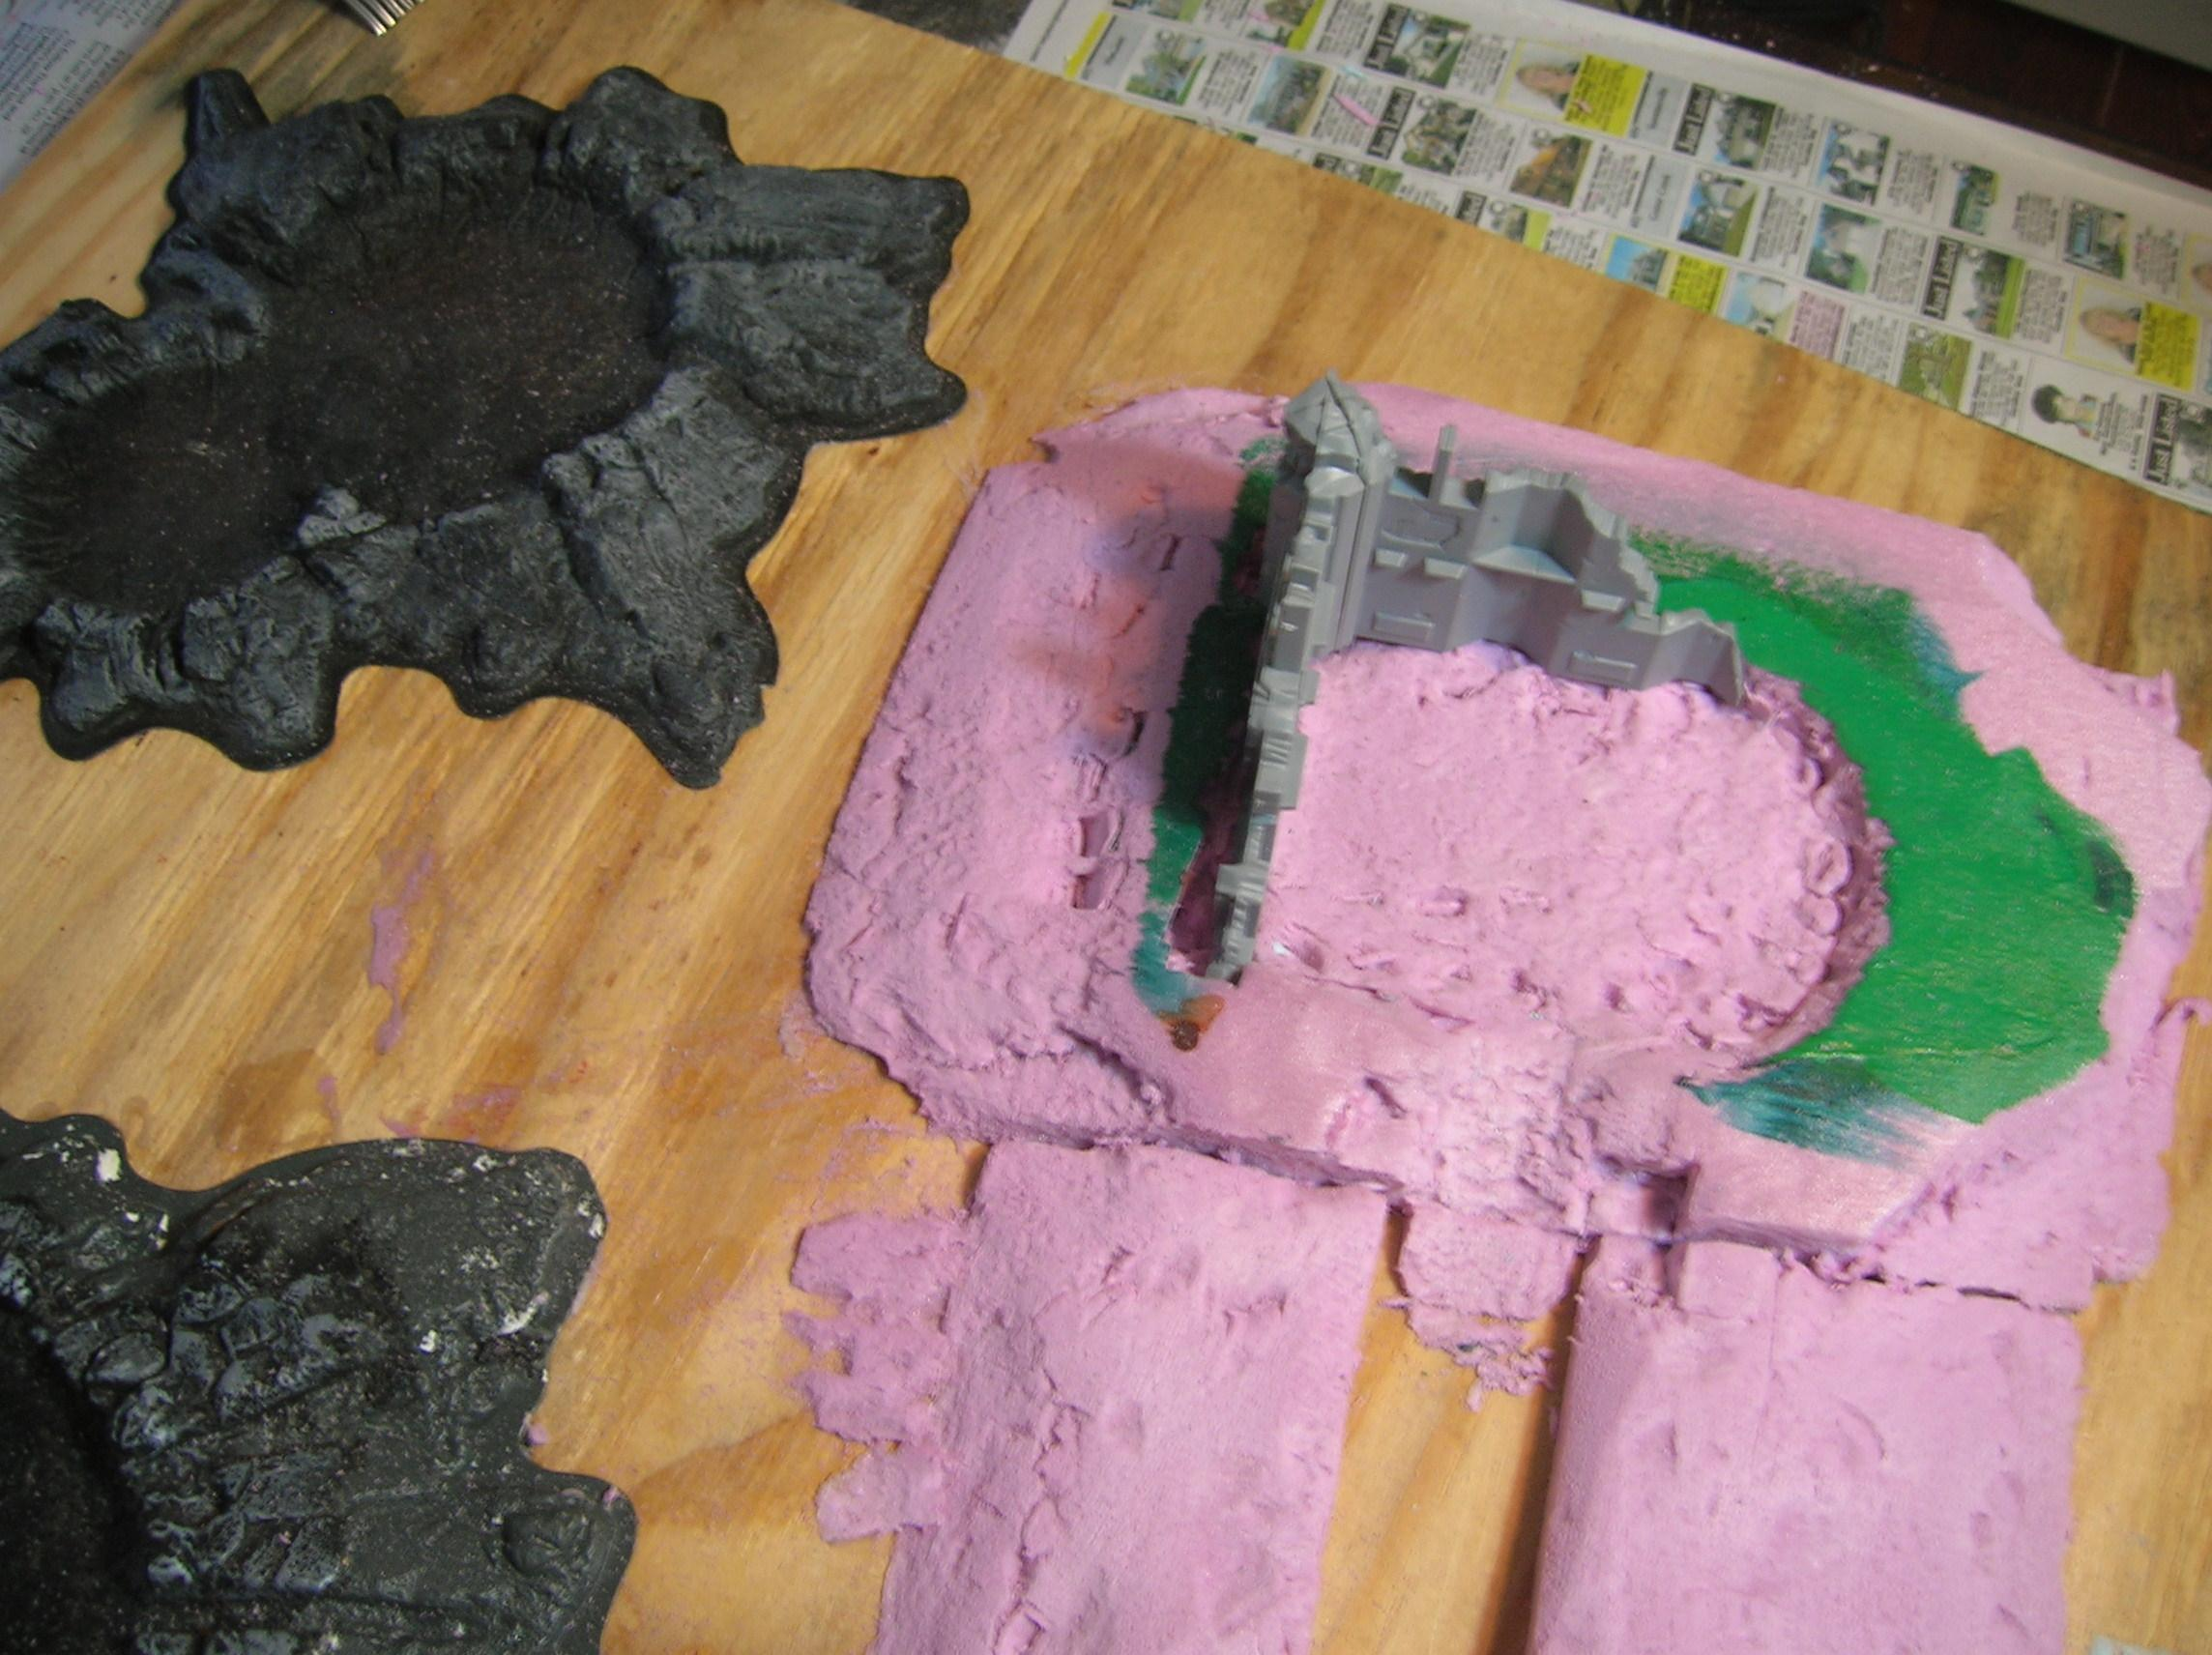 sand edges of foam down to make gradual inclines